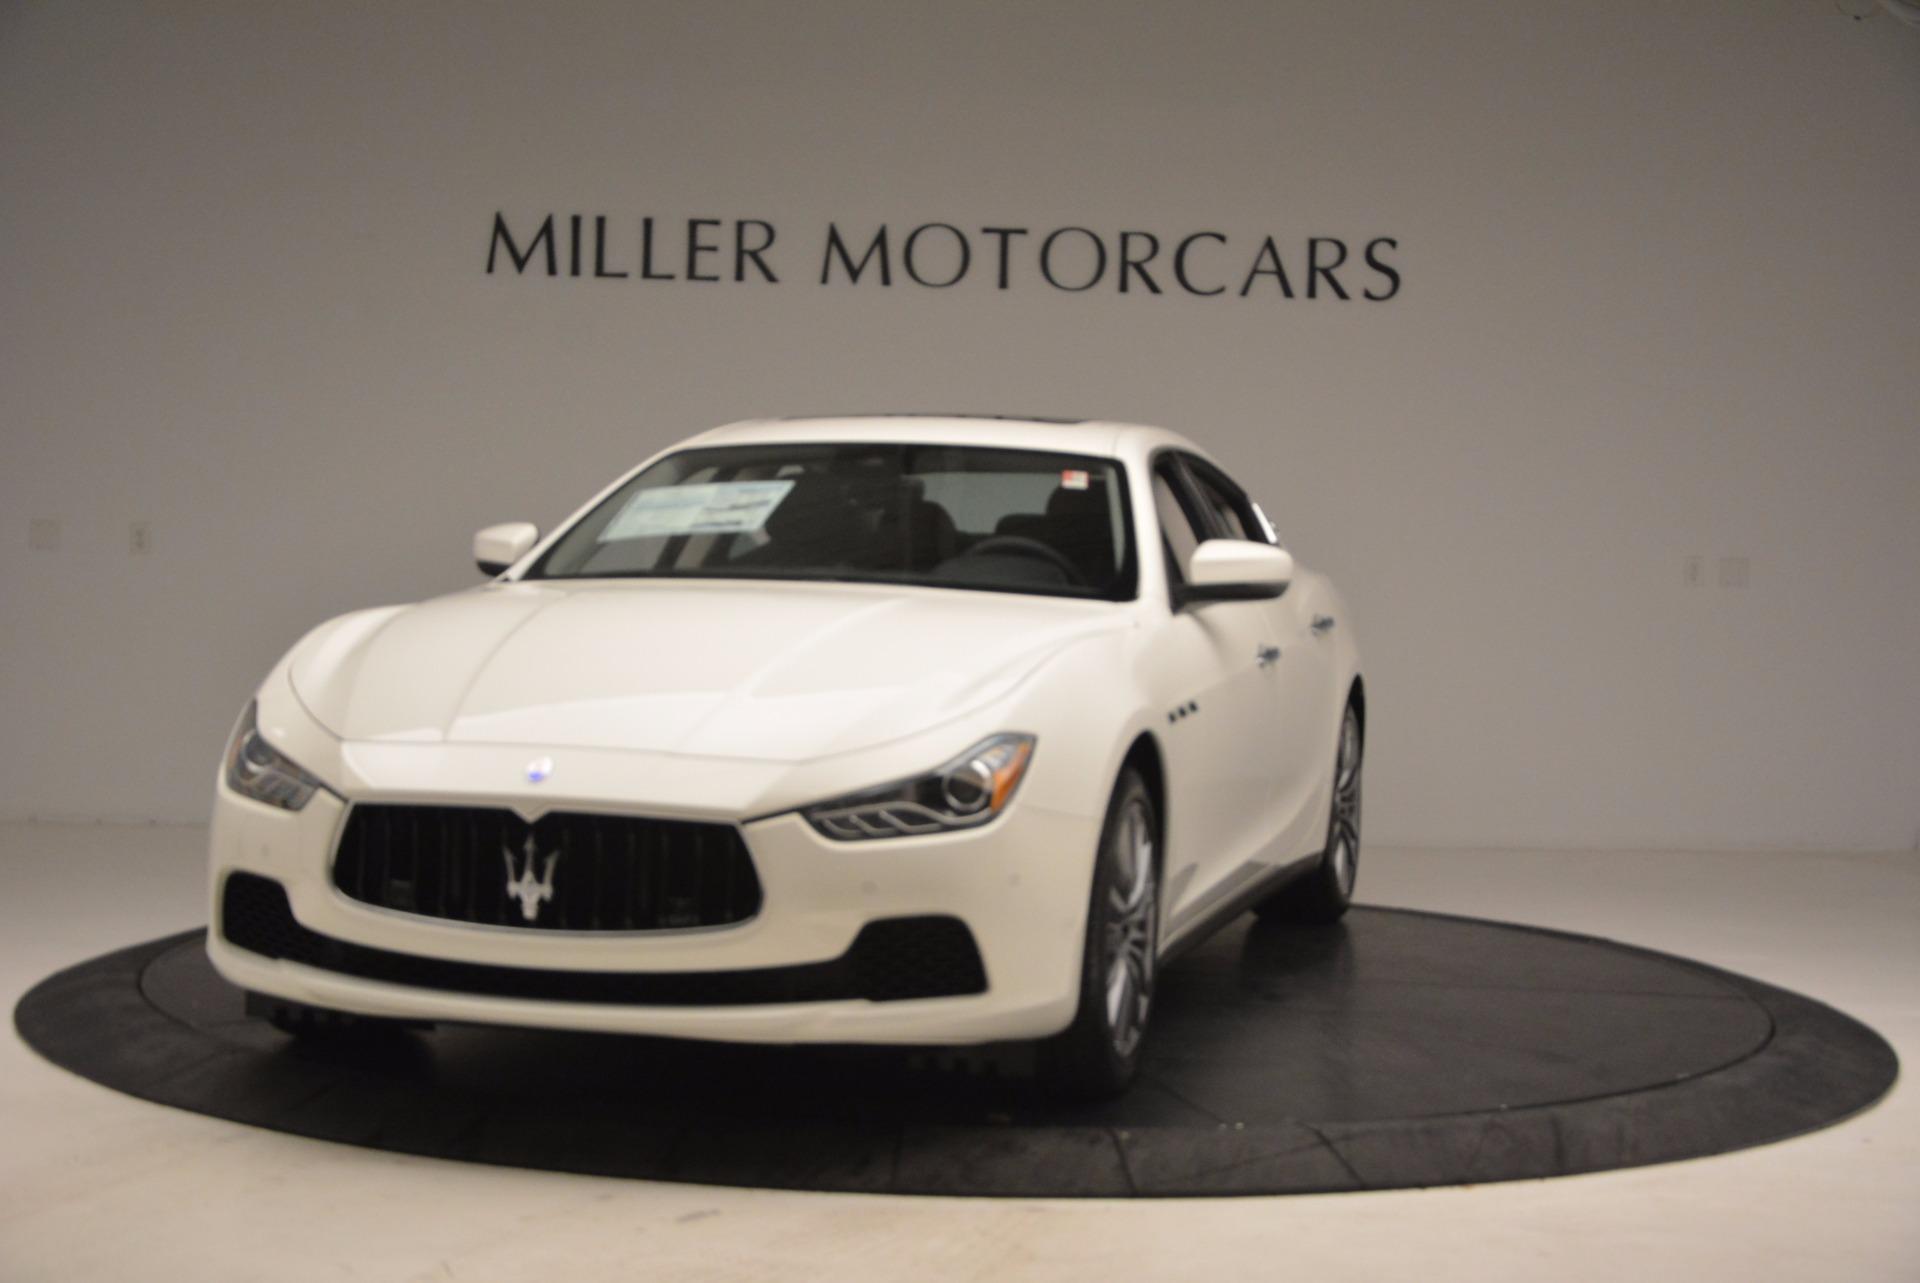 New 2017 Maserati Ghibli S Q4 EX-Loaner For Sale In Greenwich, CT 1031_main